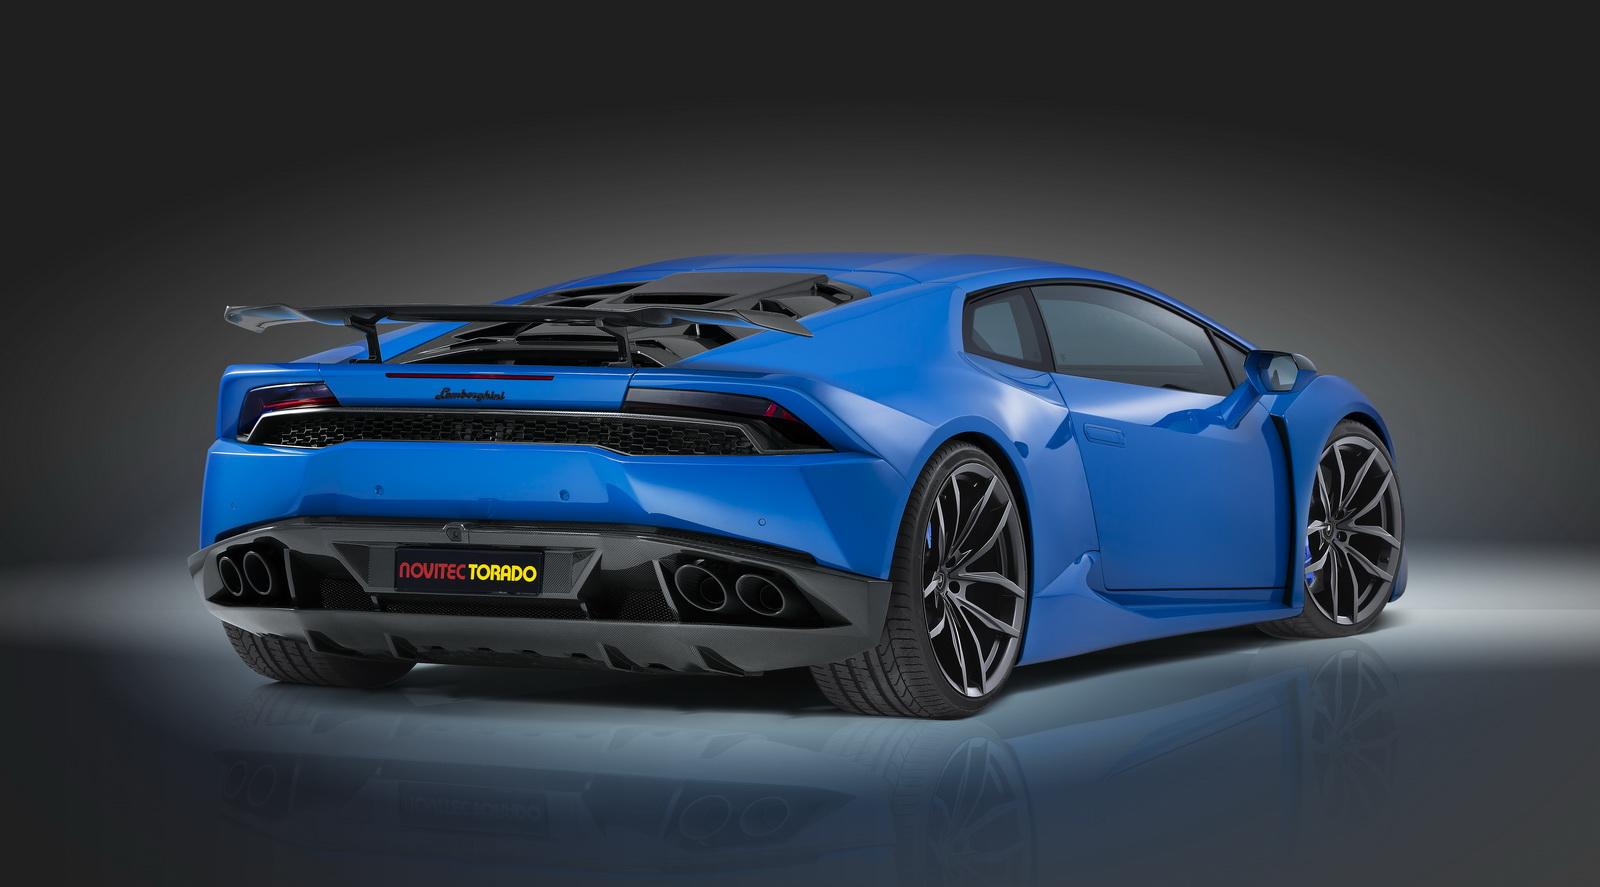 BMW X6M For Sale >> Novitec unveils N-LARGO for Lamborghini Huracán